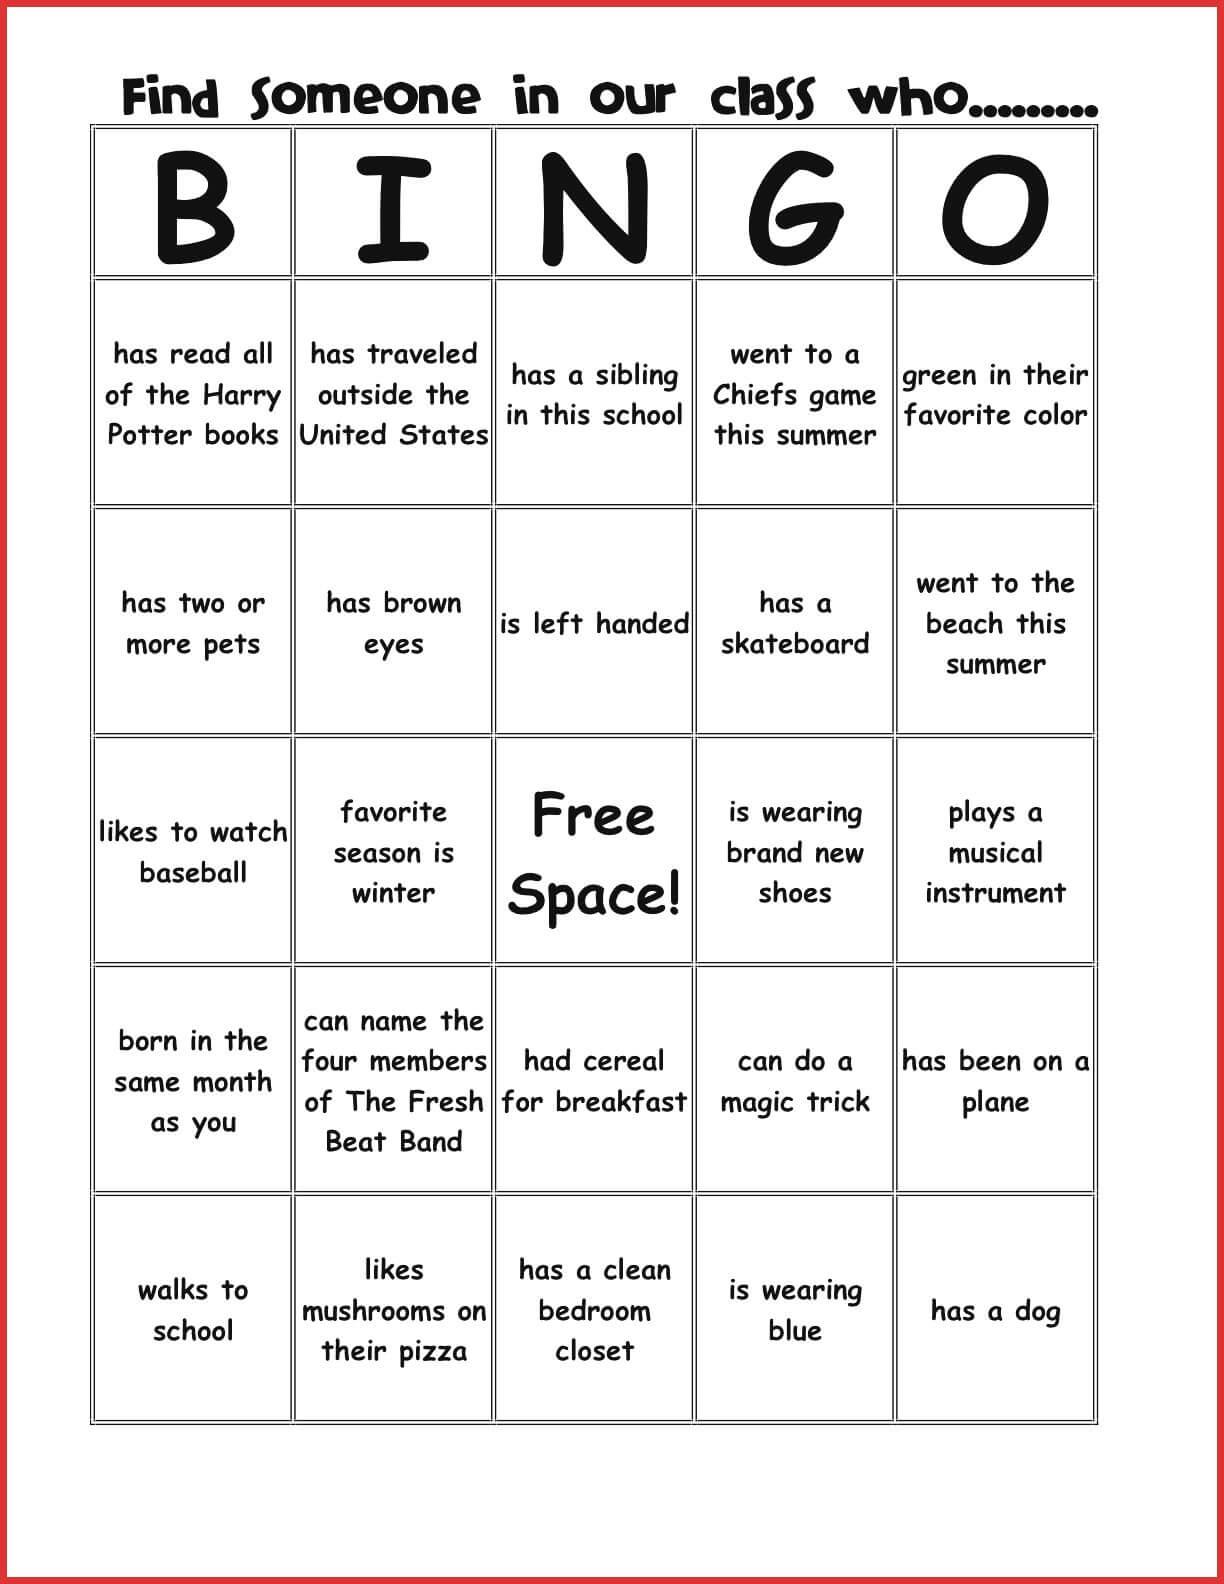 New Bingo Card Template | Leave Latter For Ice Breaker Bingo Card Template